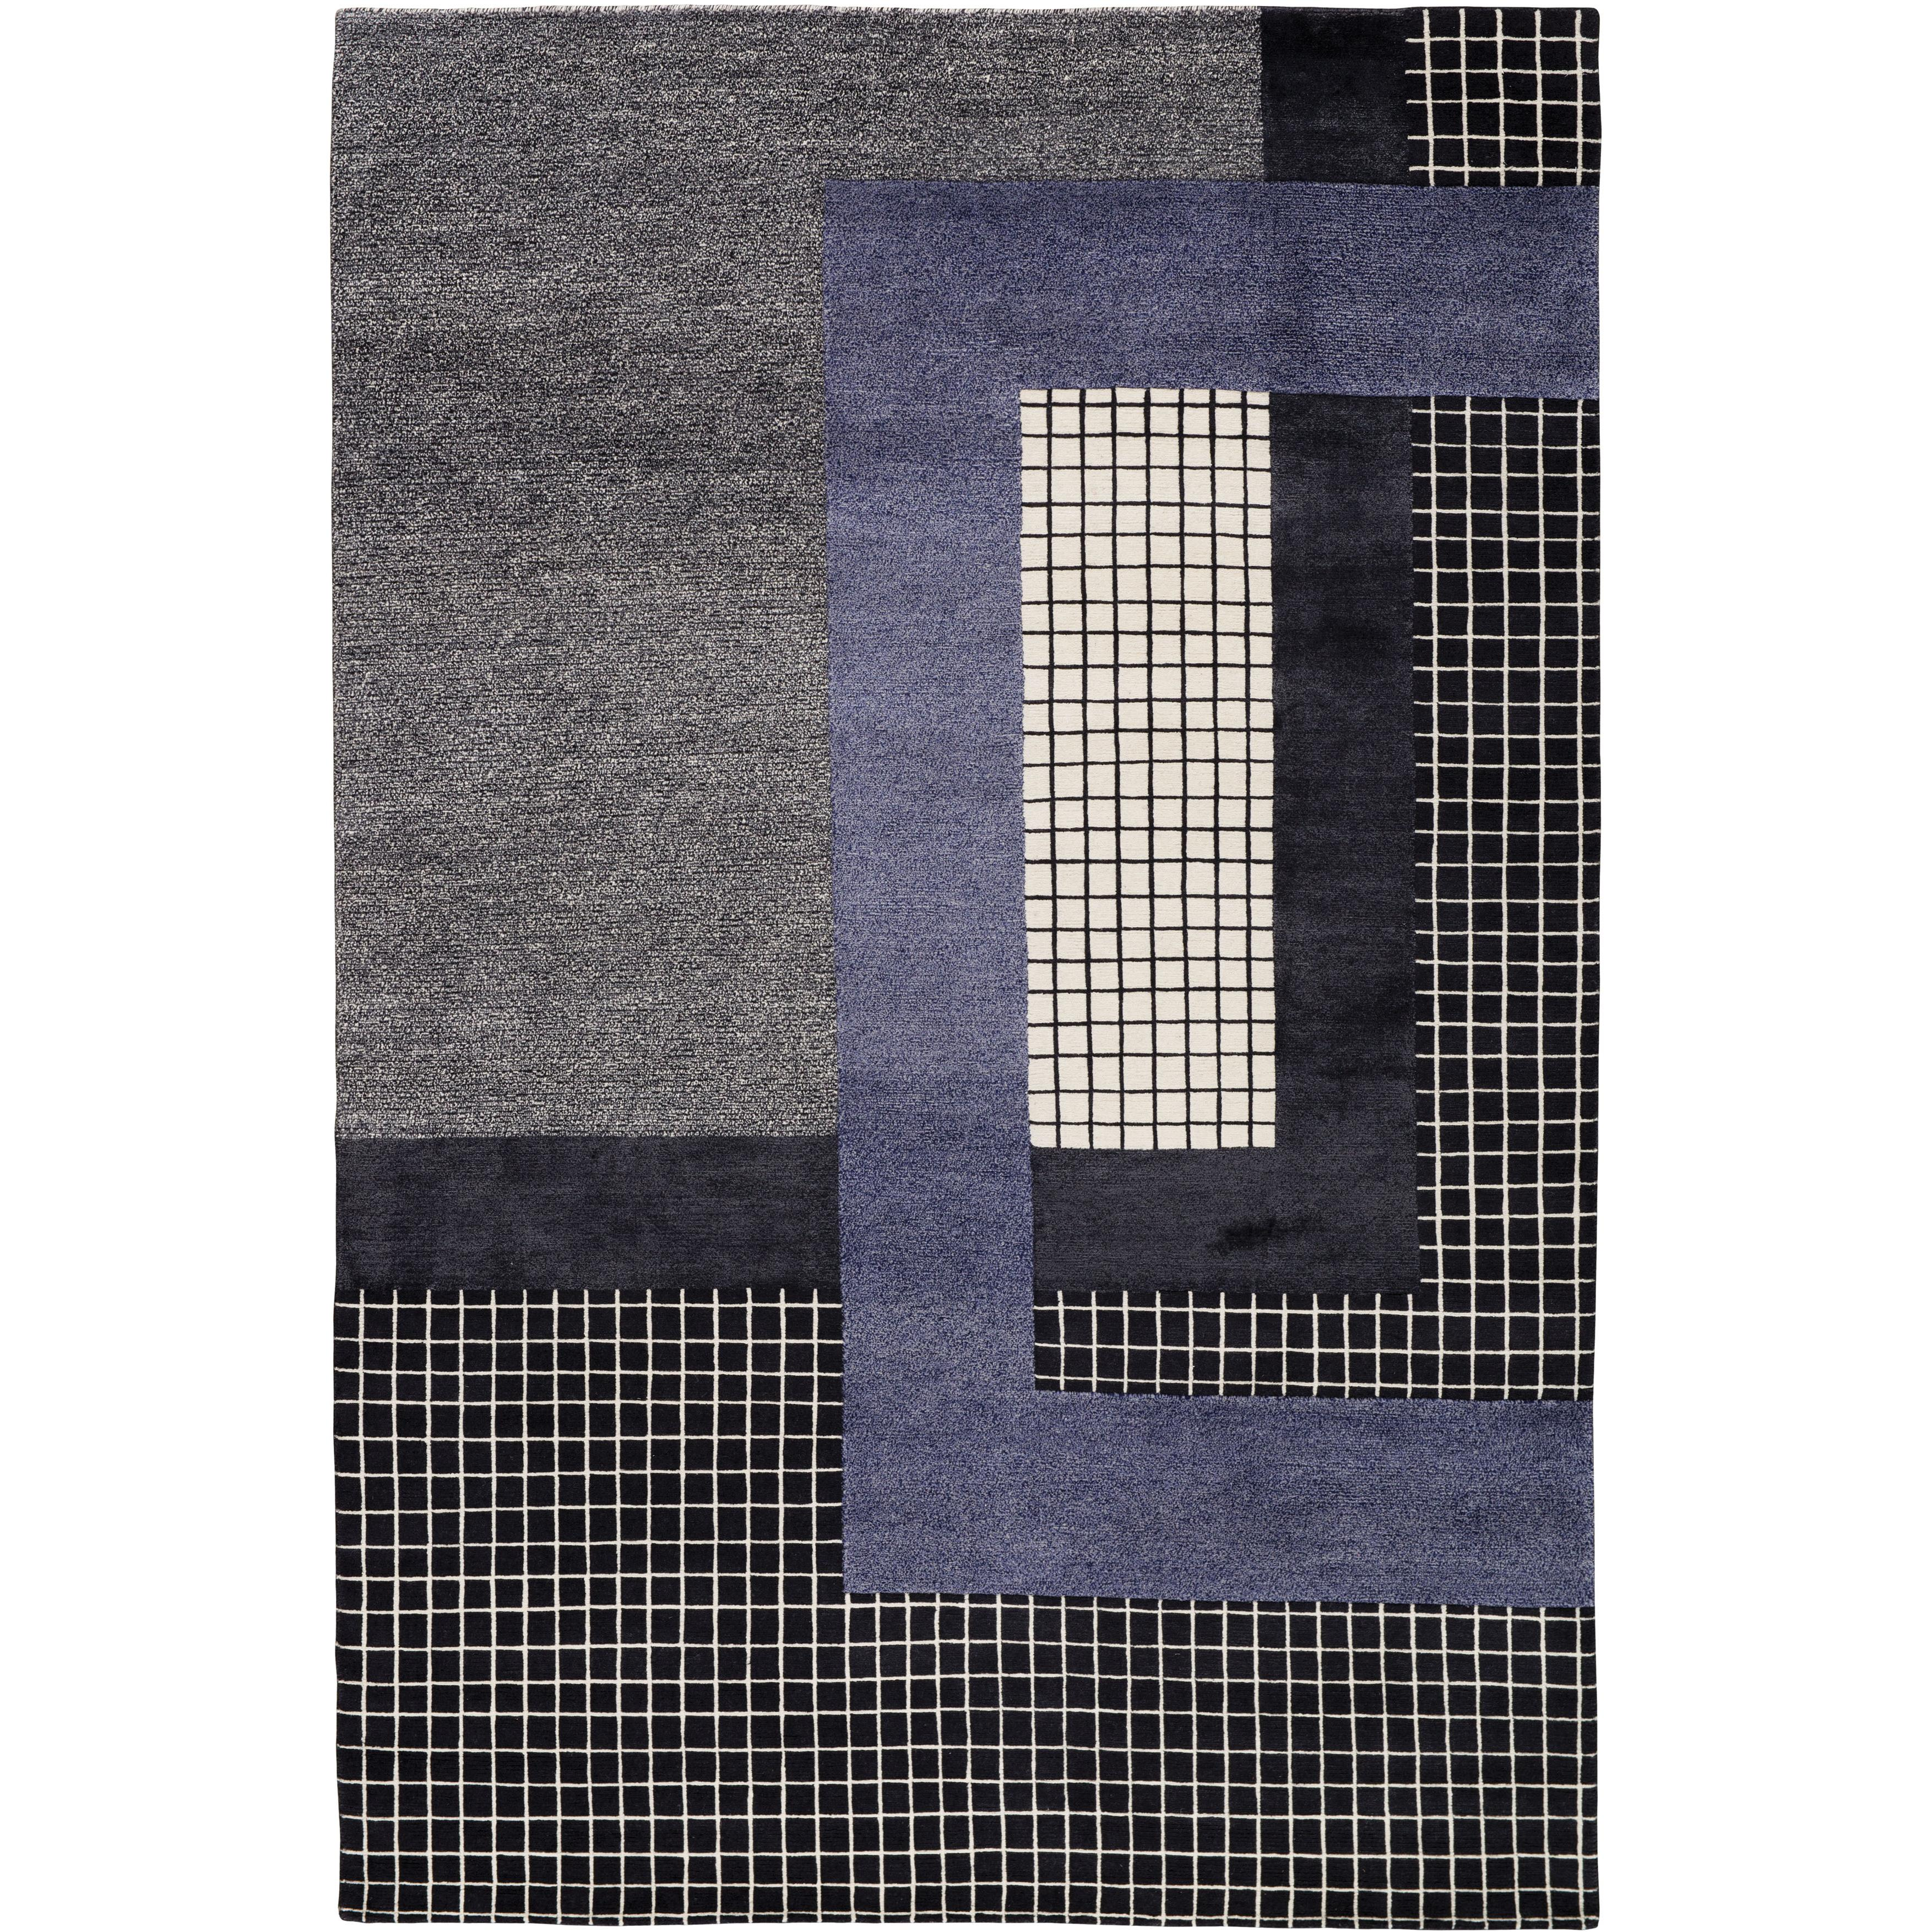 Mainland Dark Hand-Knotted 10x8 Rug in Wool and Silk by Sebastian Herkner